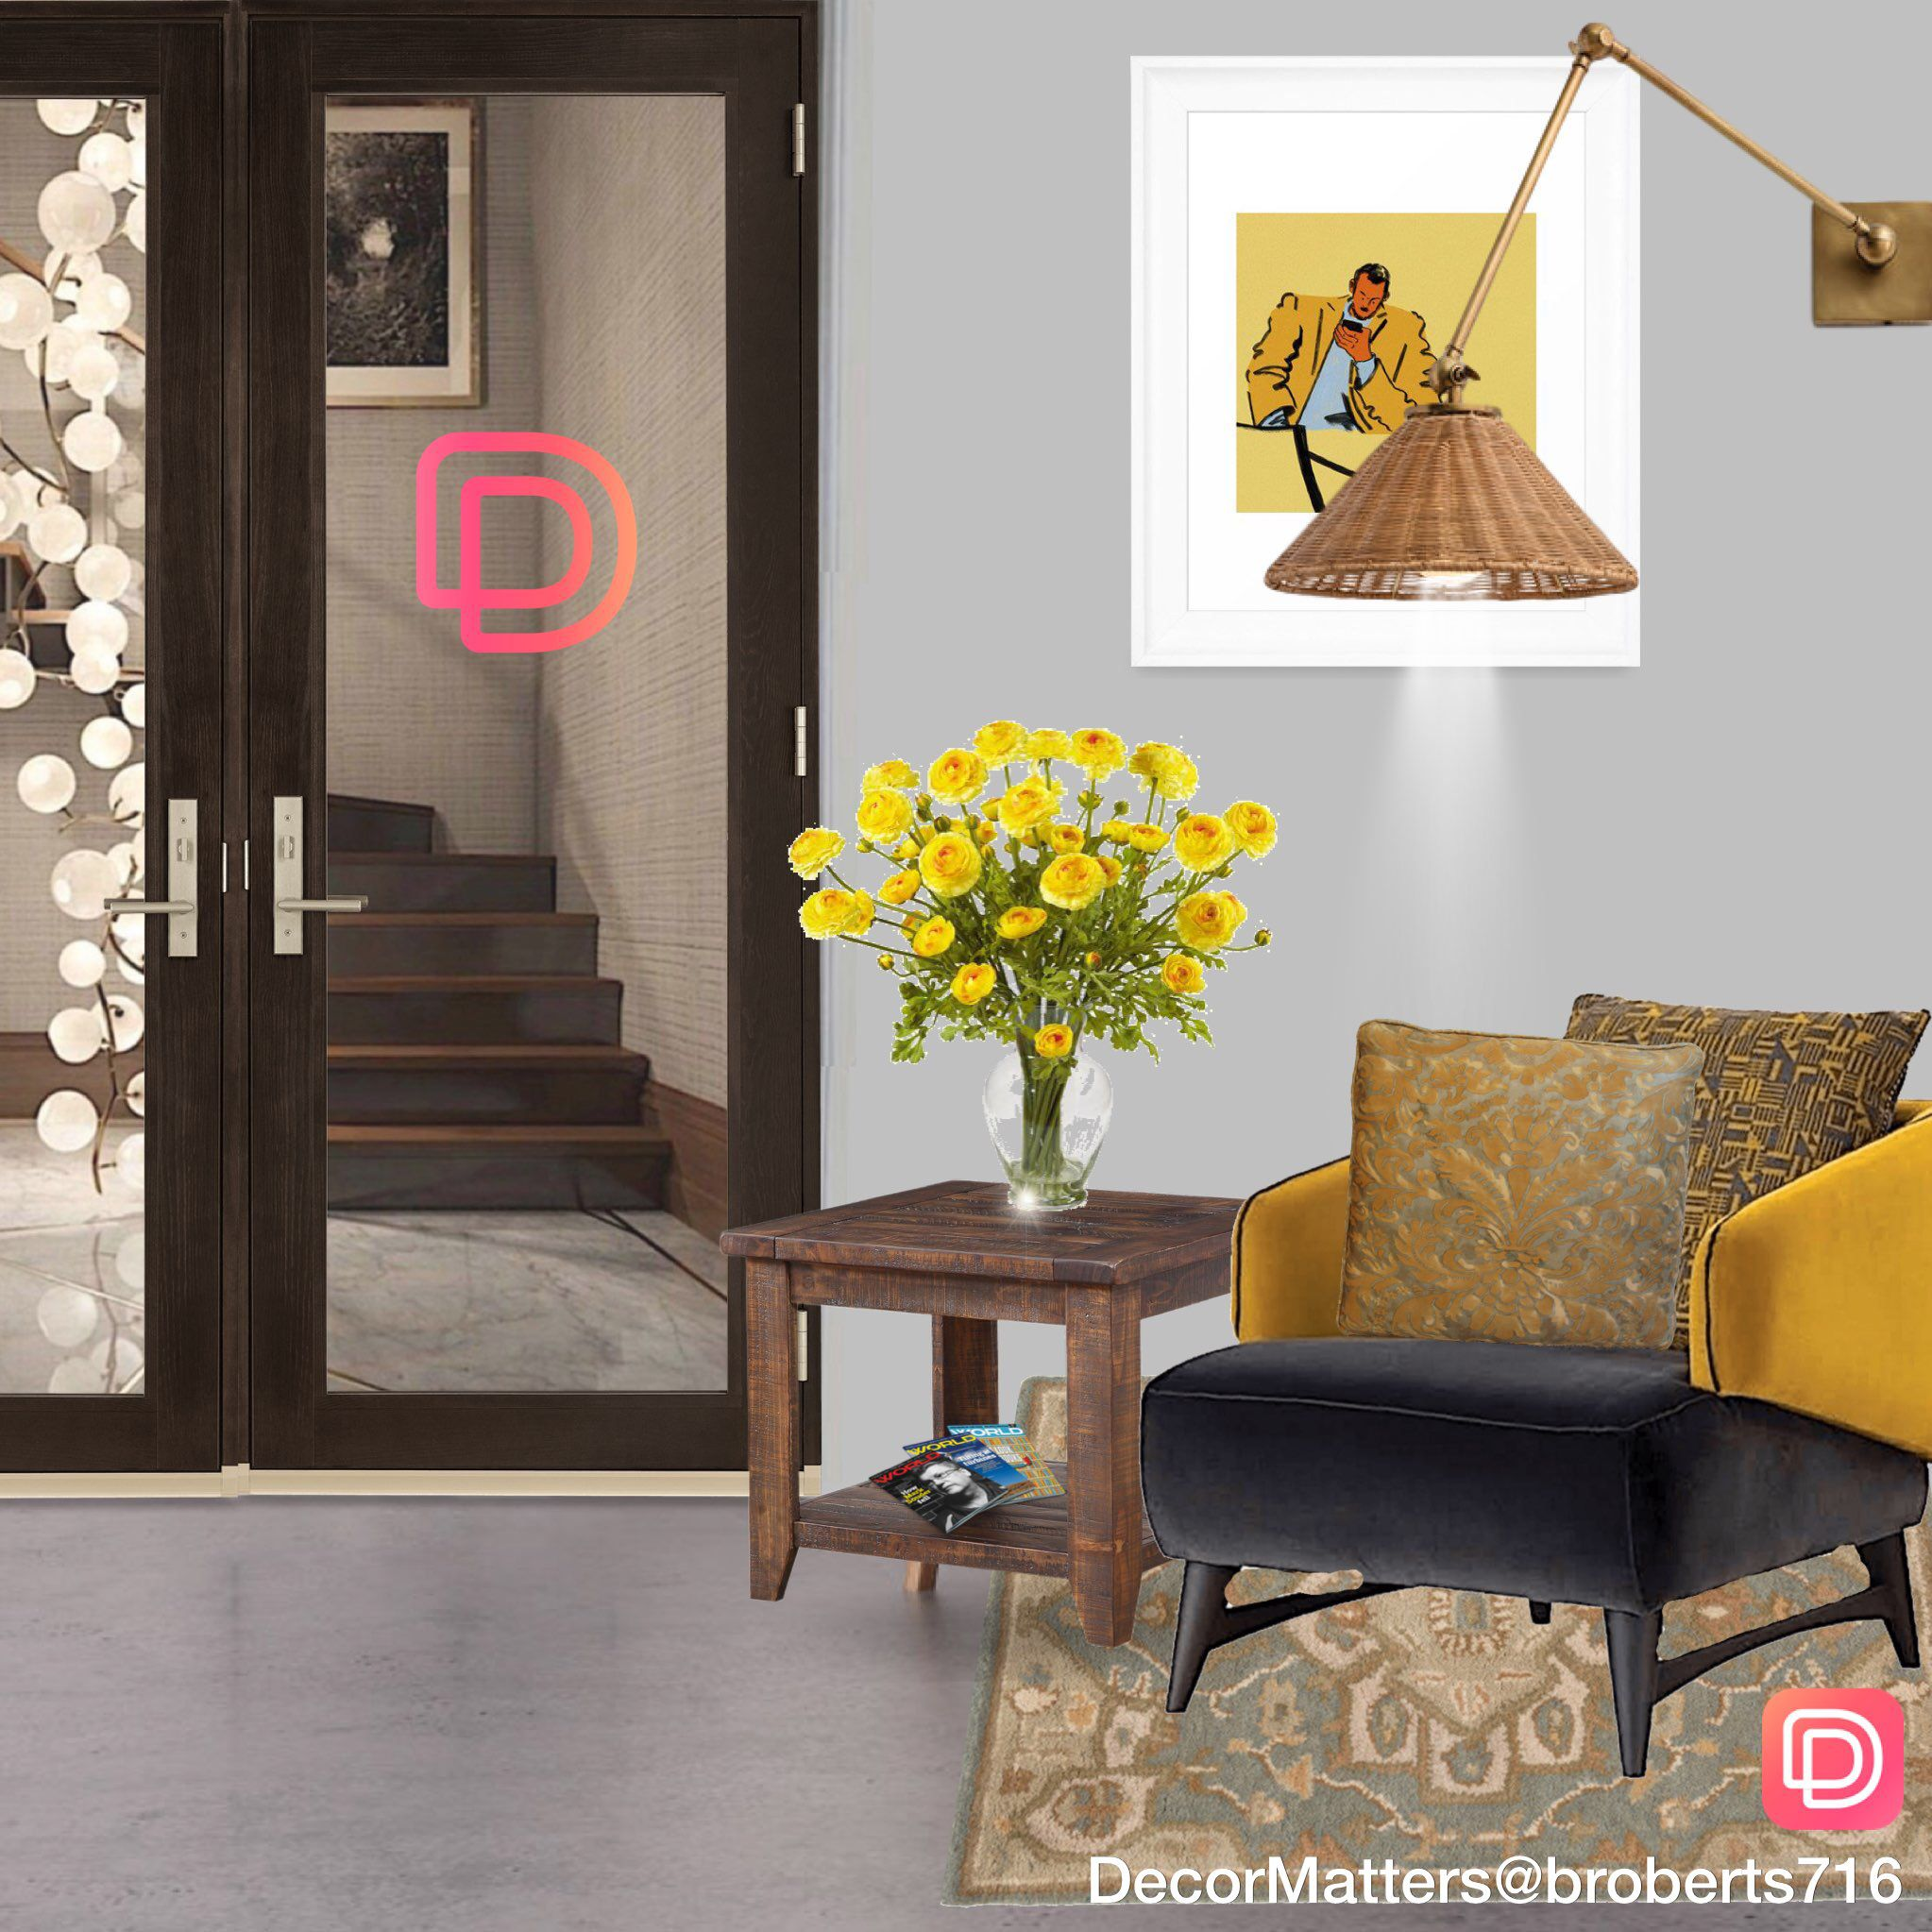 Https Decormatters App Link A7klgpeg64 2020 Interior Design Interior Design